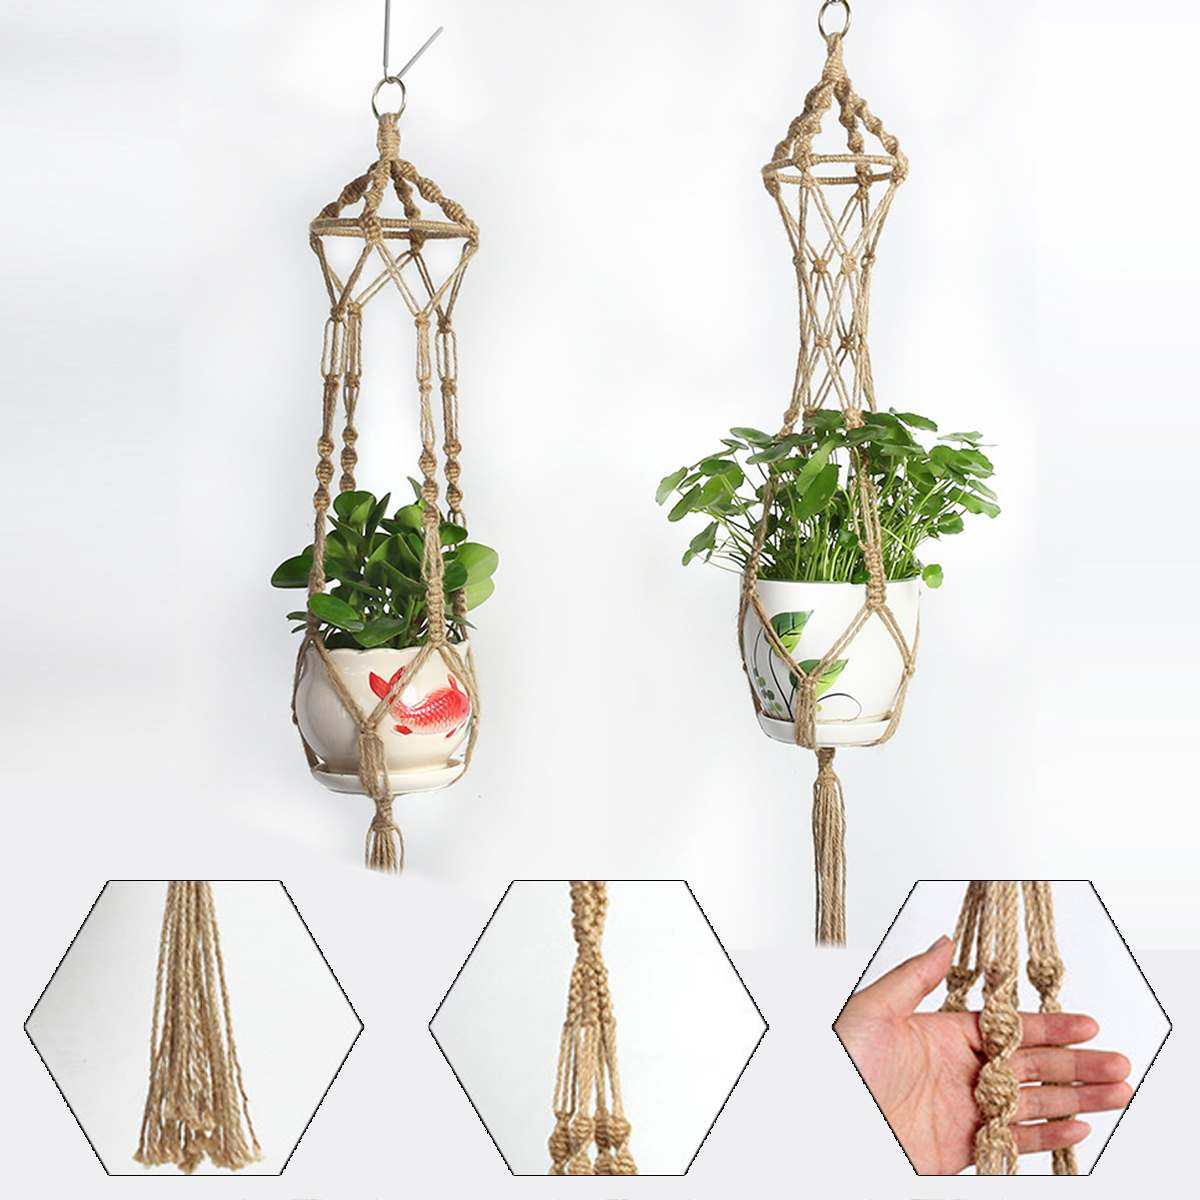 Vintage Decor Macrame Plant Hanger Basket Flowerpot Plant Holder Macrame Hanging Knotted Lifting Rope Garden Home Garden Decor